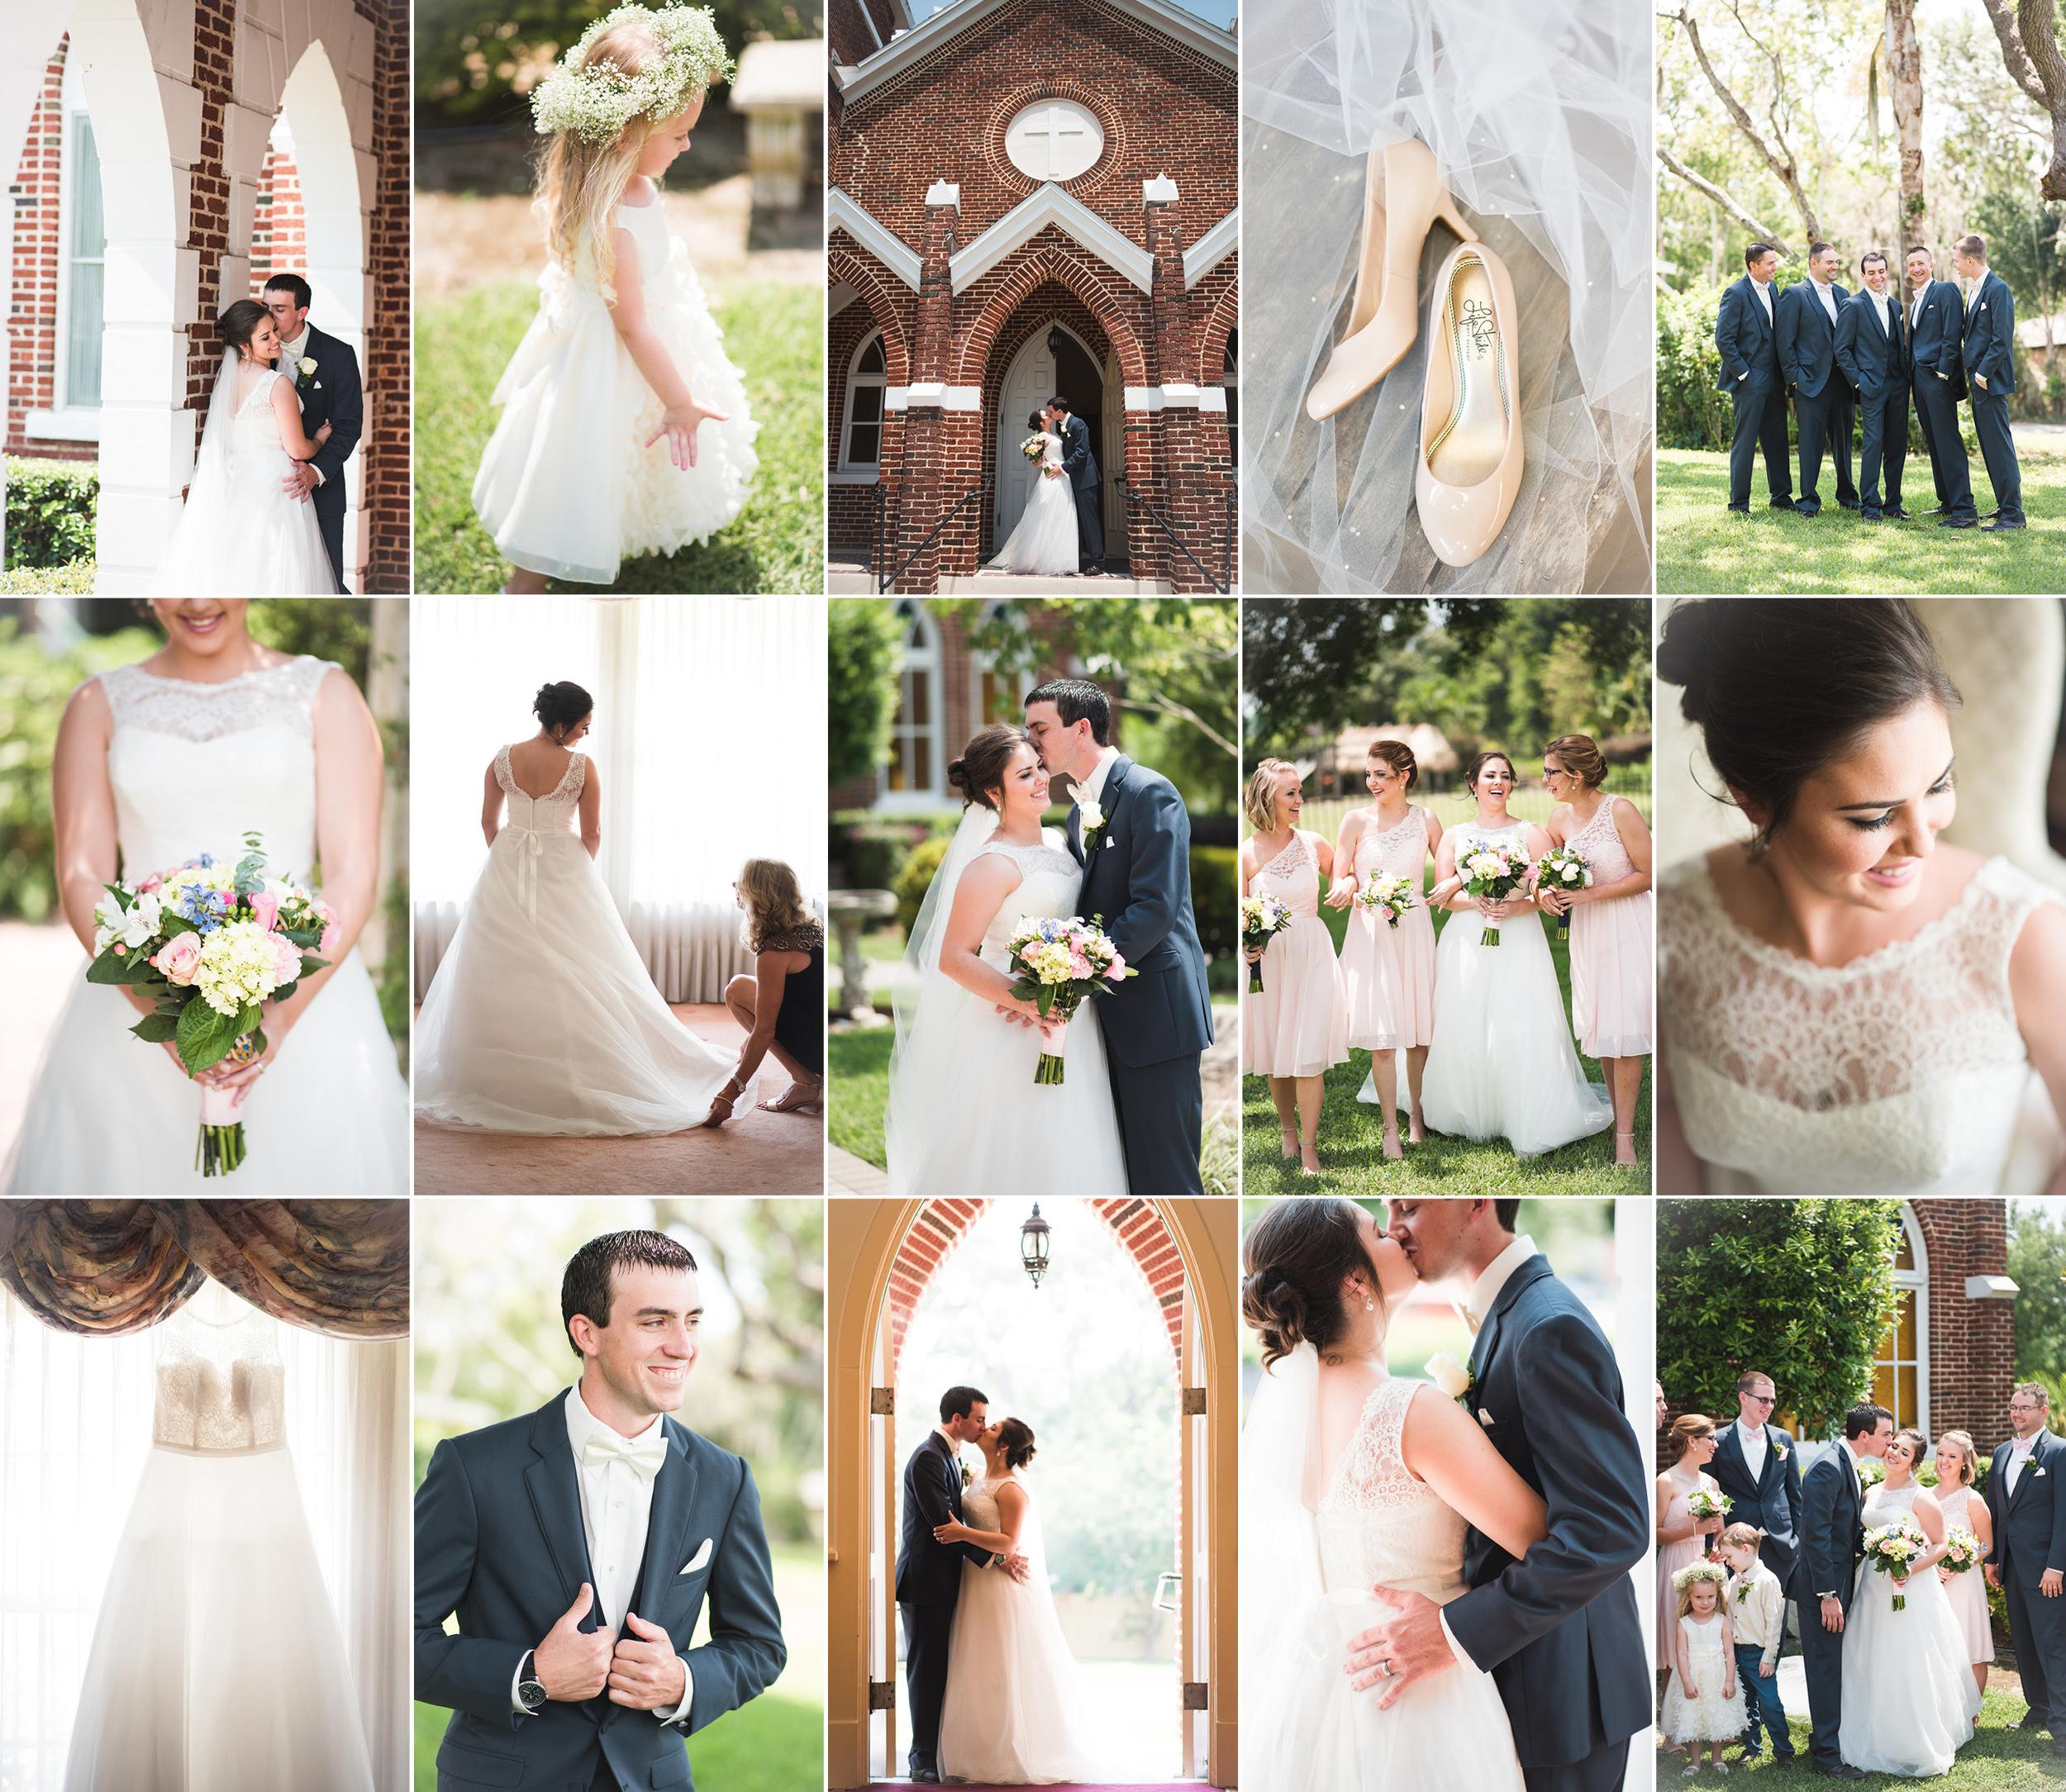 Brandy + Cannon - Lake Placid, FL Wedding Photography with Caroline Maxcy Photography.